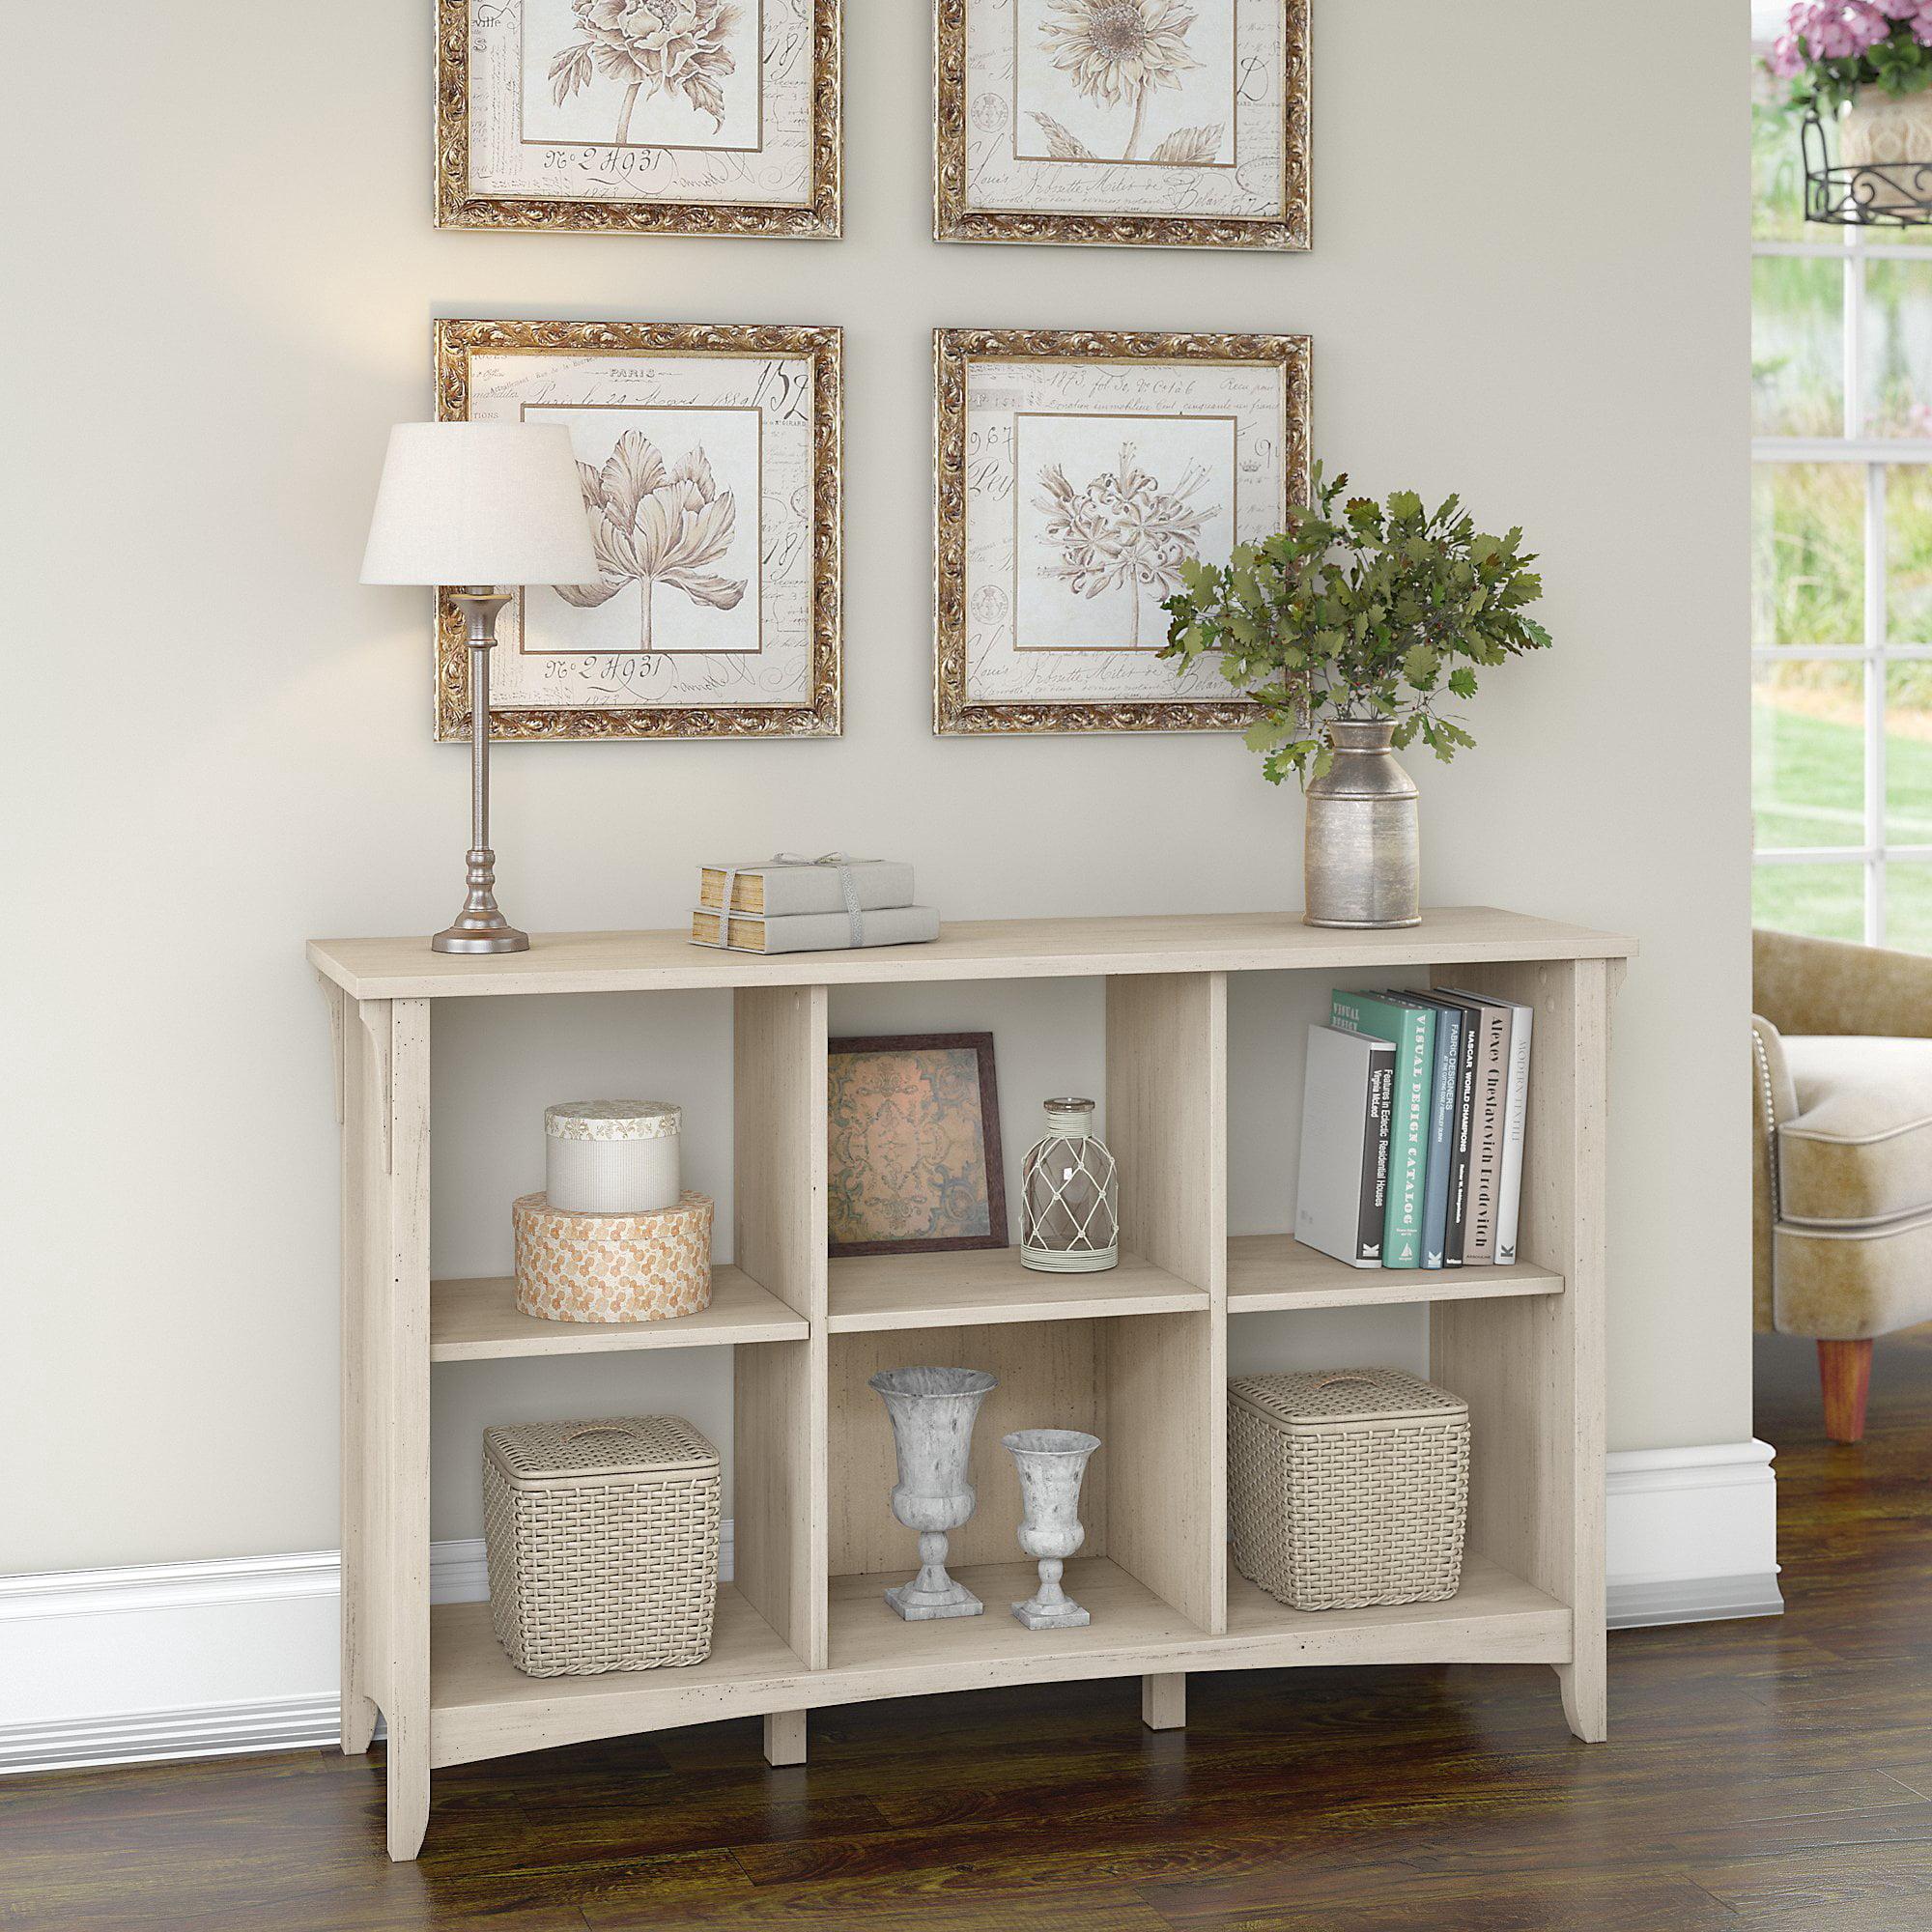 Bush Furniture Salinas Wood 6 Shelf Cube Organizer In Antique White Walmart Com Walmart Com